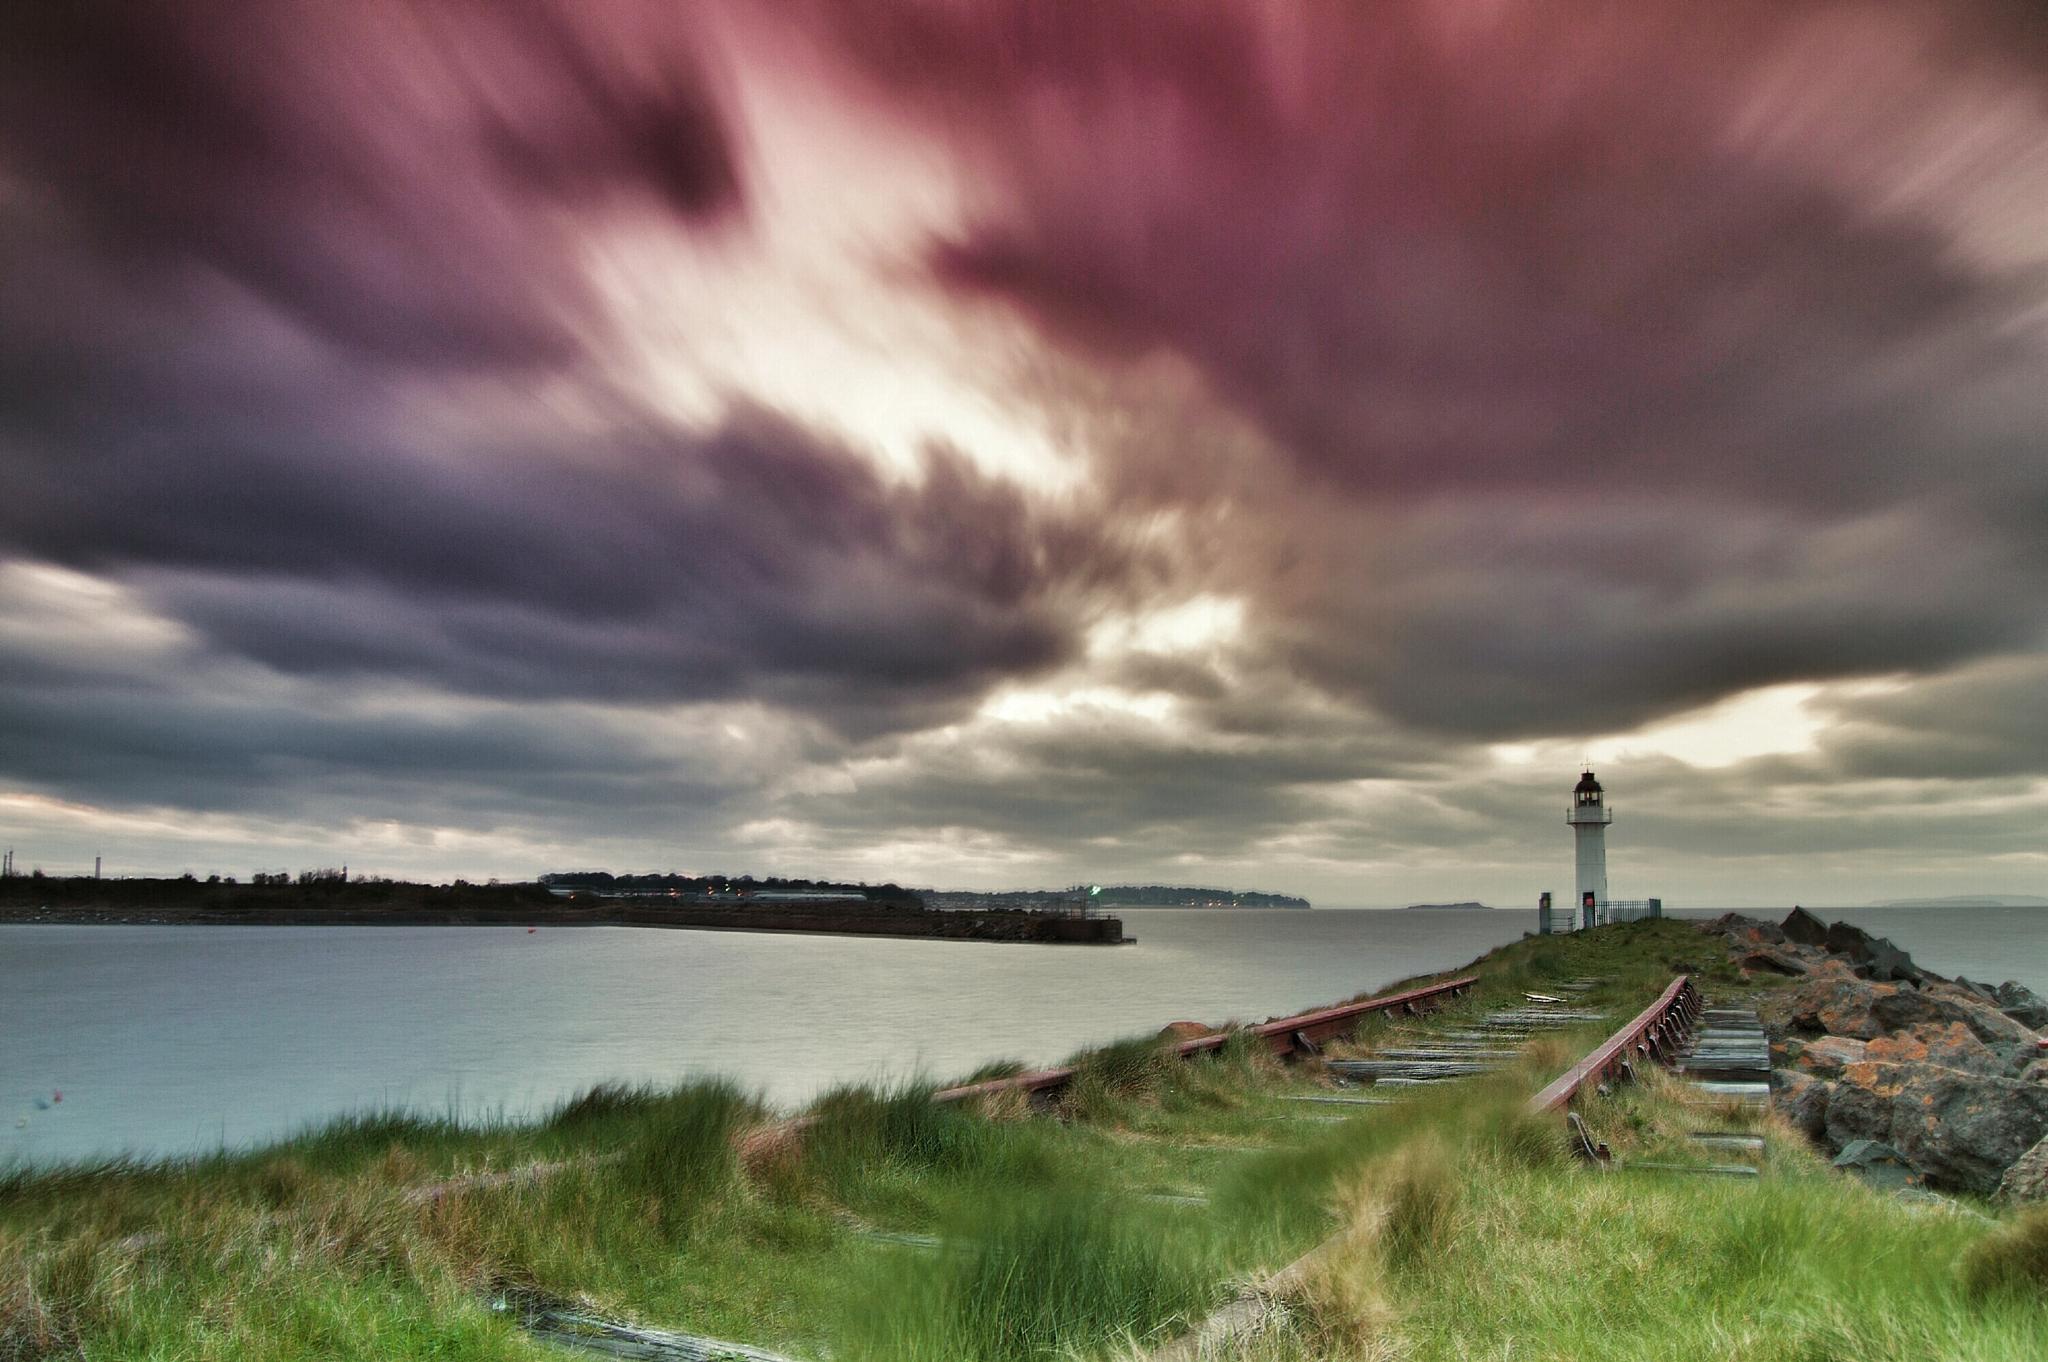 sky above the pier by bryan.ashford 52